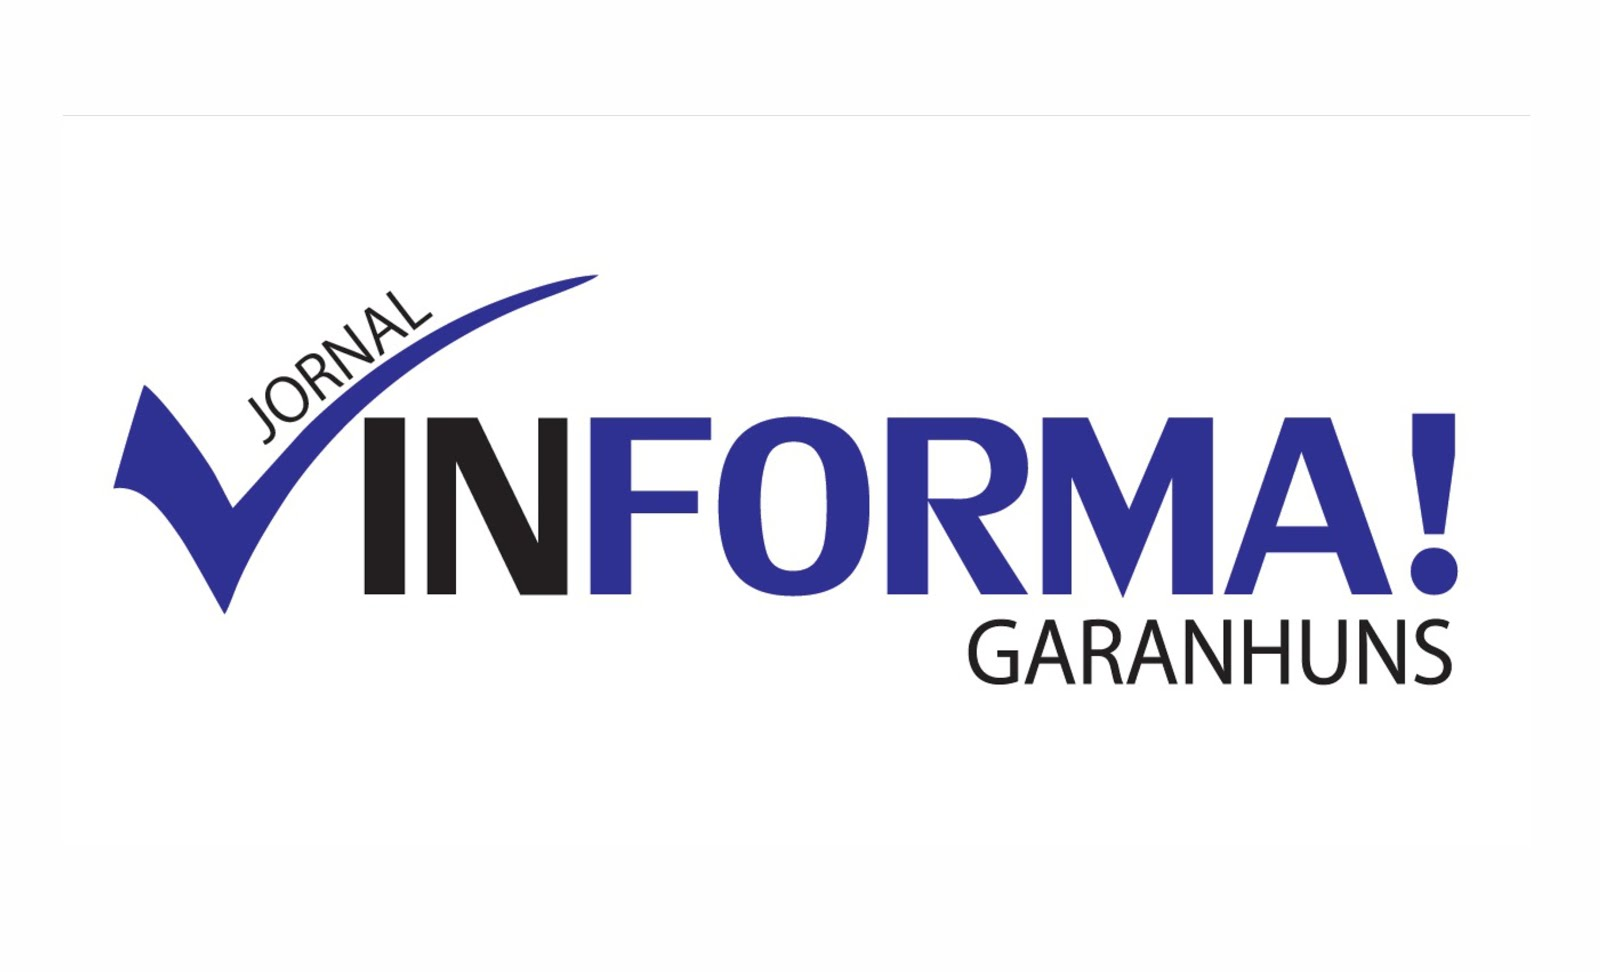 APOIO - JORNAL INFORMA GARANHUNS